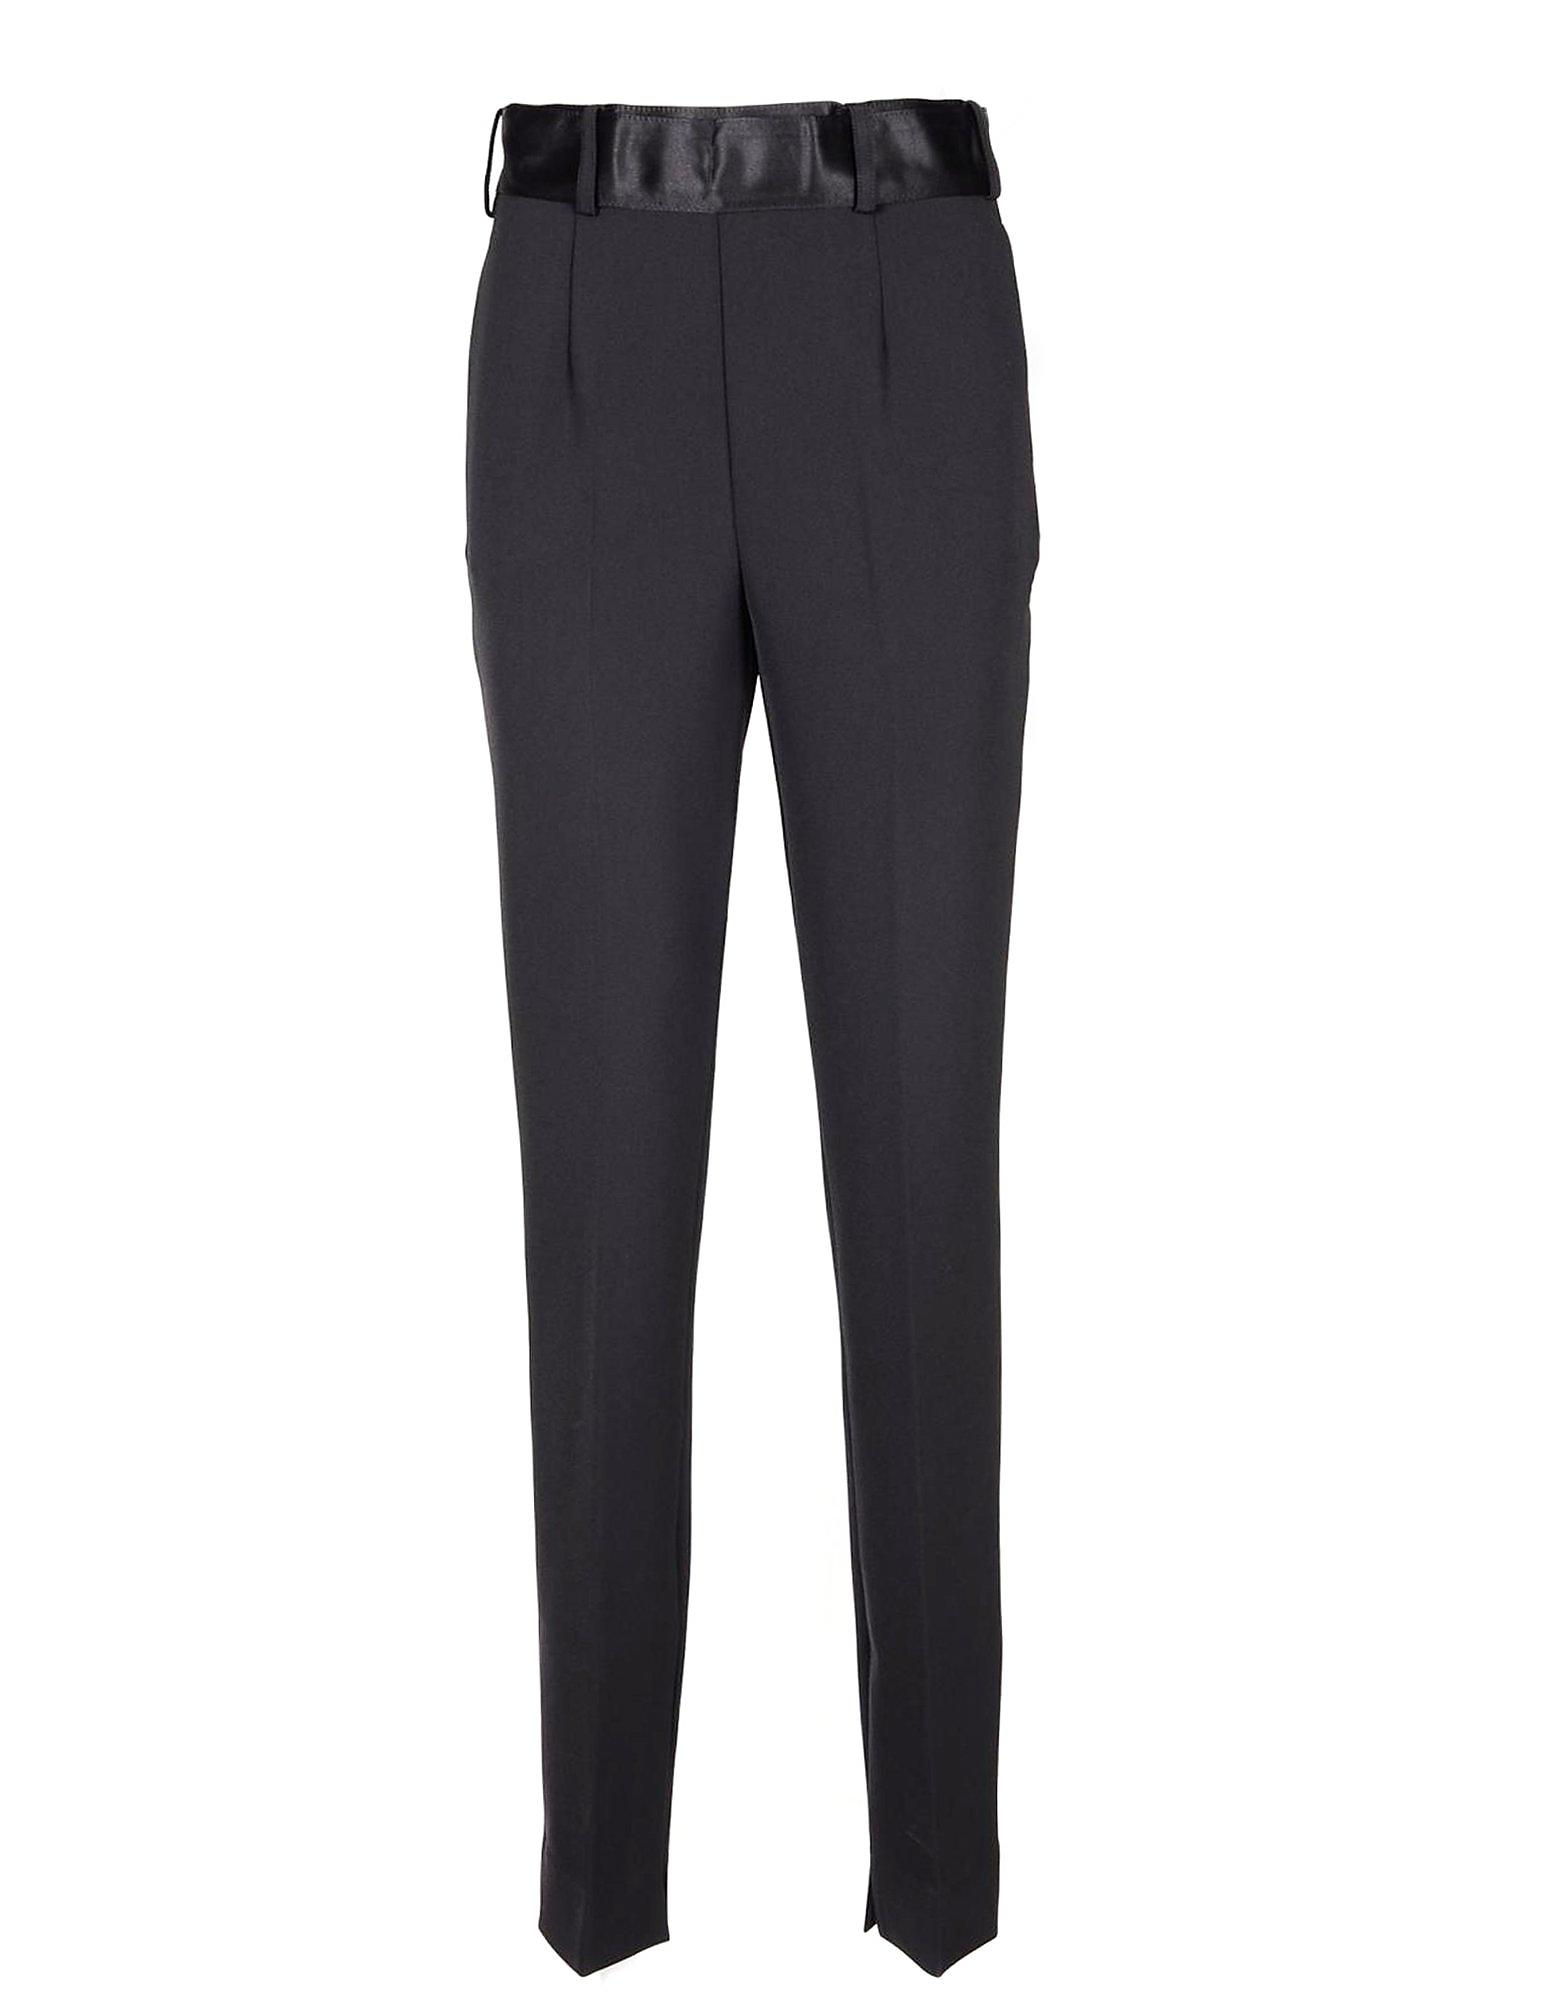 Manila Grace Designer Pants, Women's Black Pants